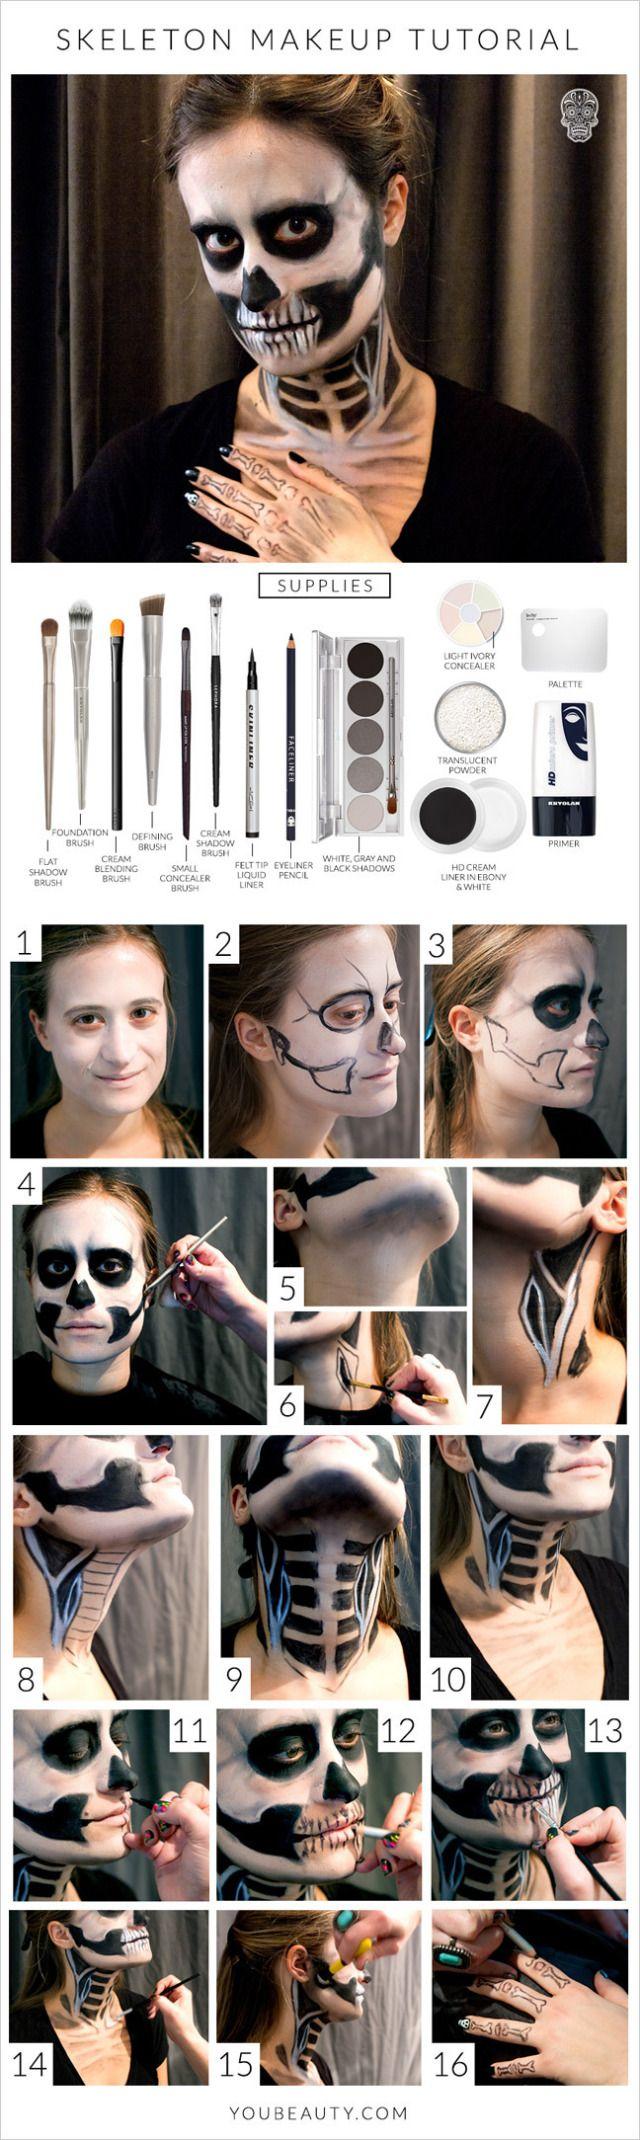 skelton face halloween makeup